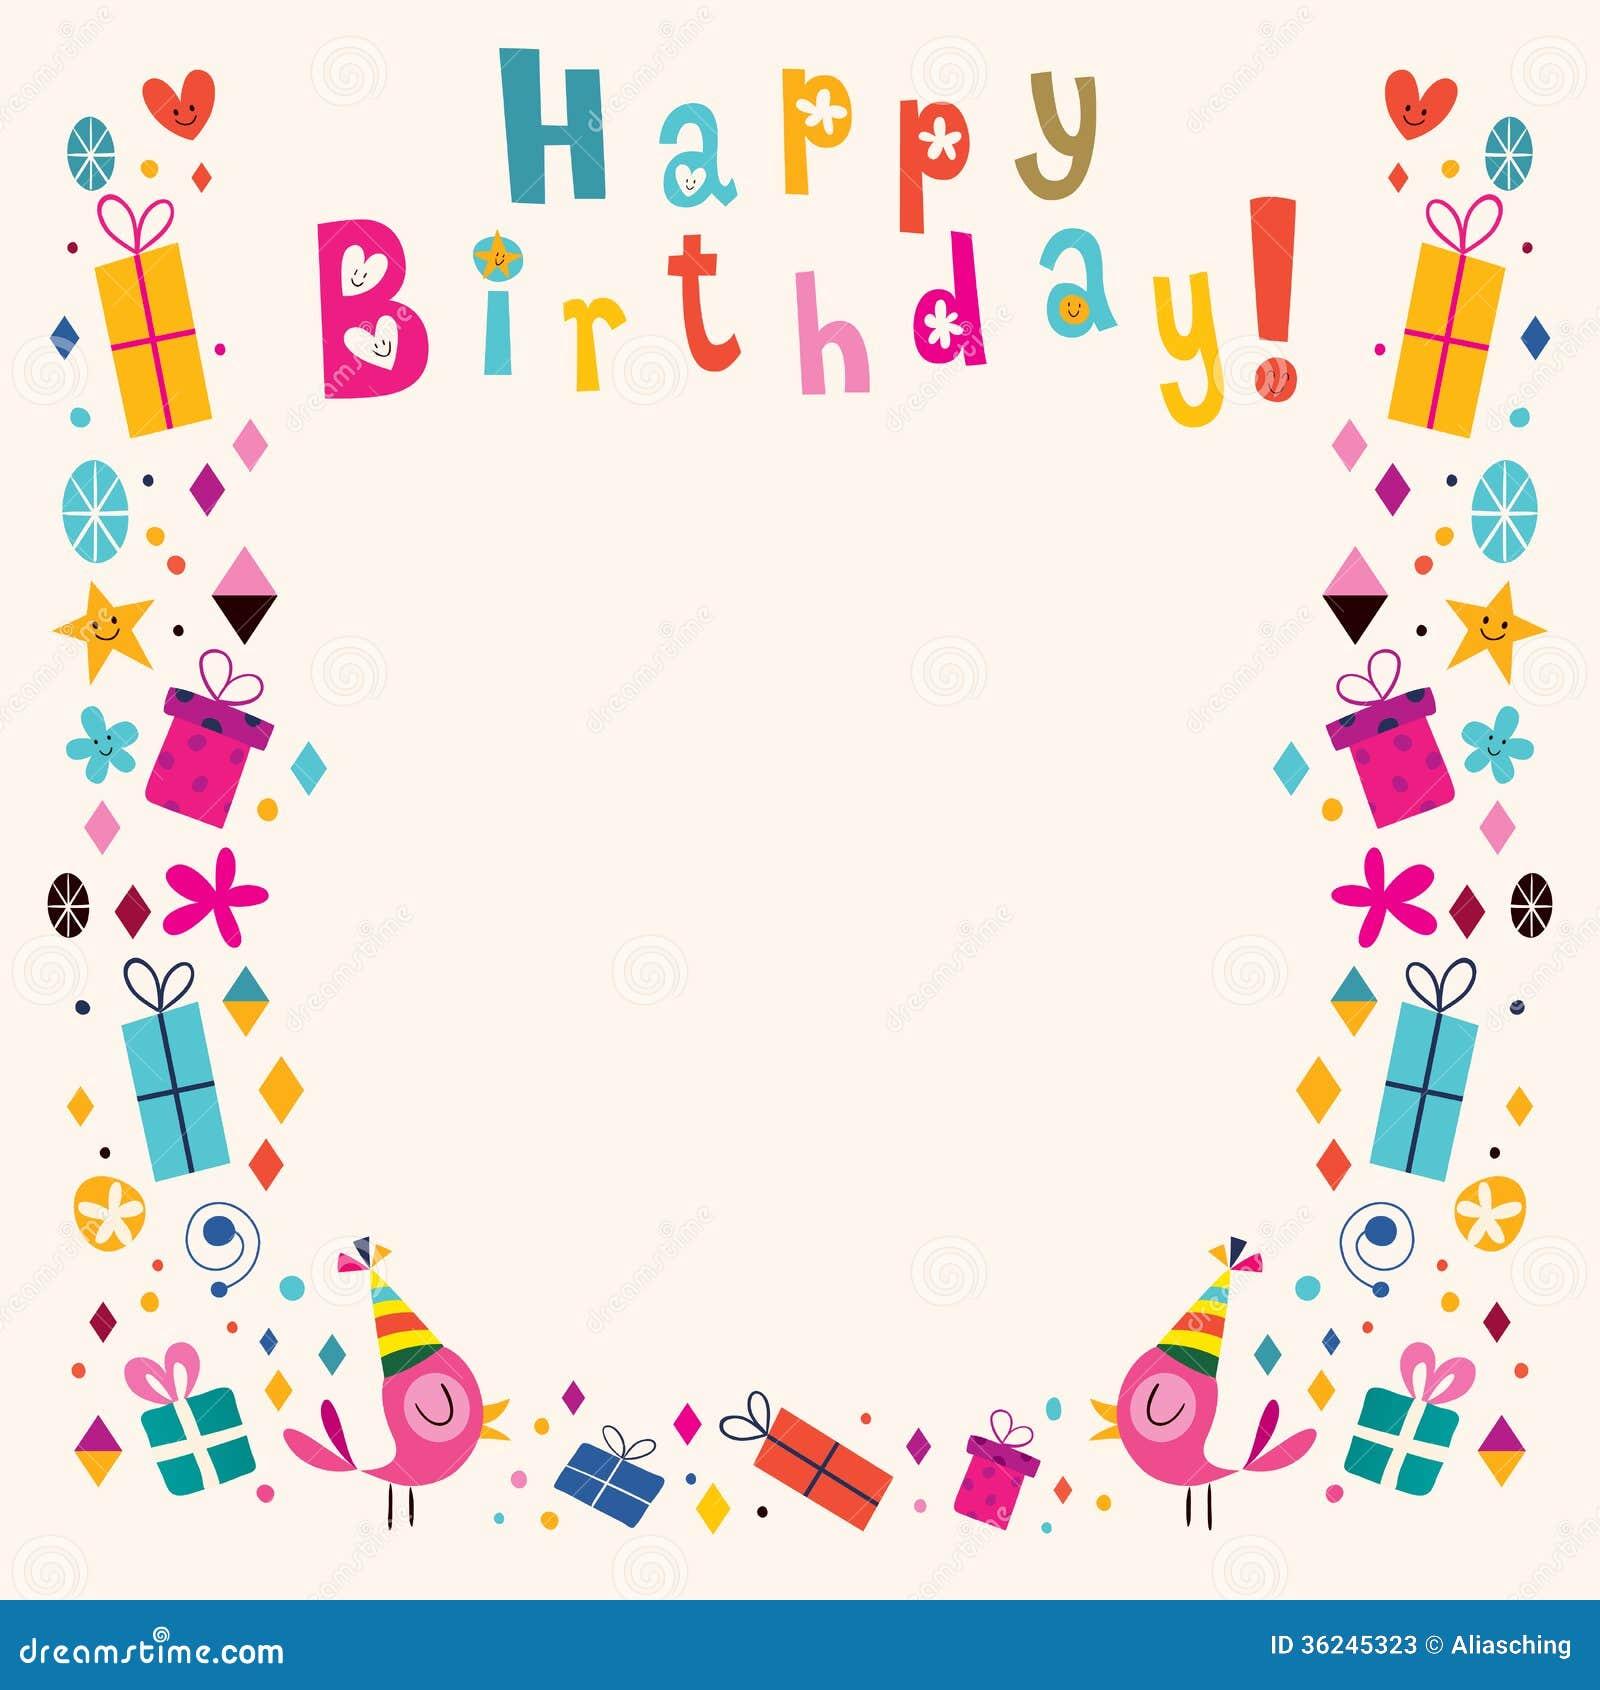 Happy Birthday Border Retro Card Photos Image 36245323 – Birthday Cards Borders